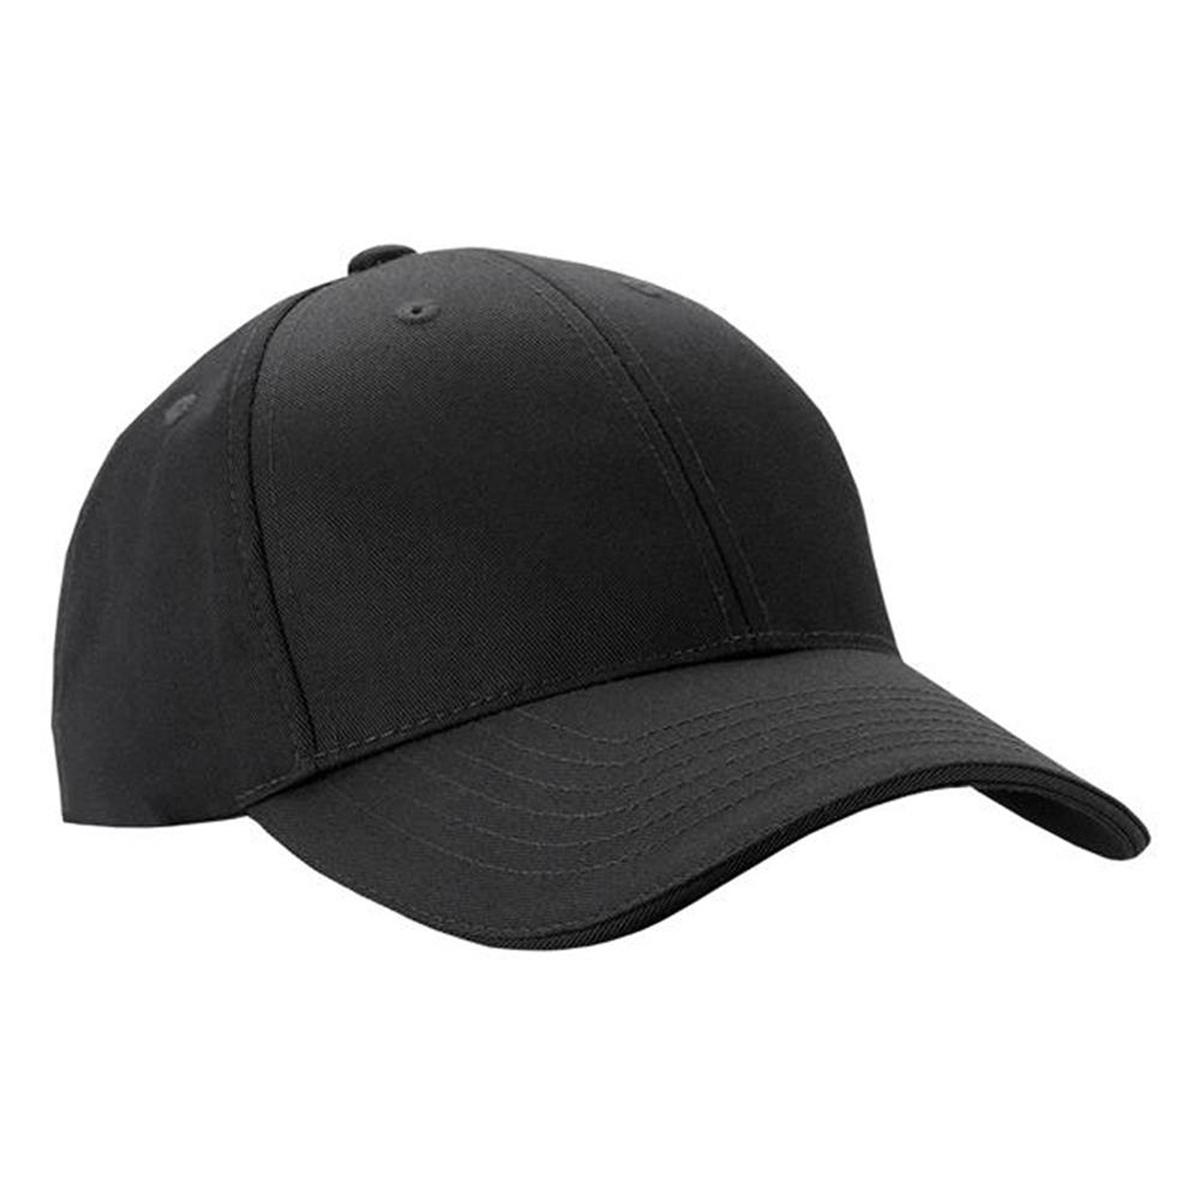 5.11 Uniform Hat - Black 5f9aeb874b34